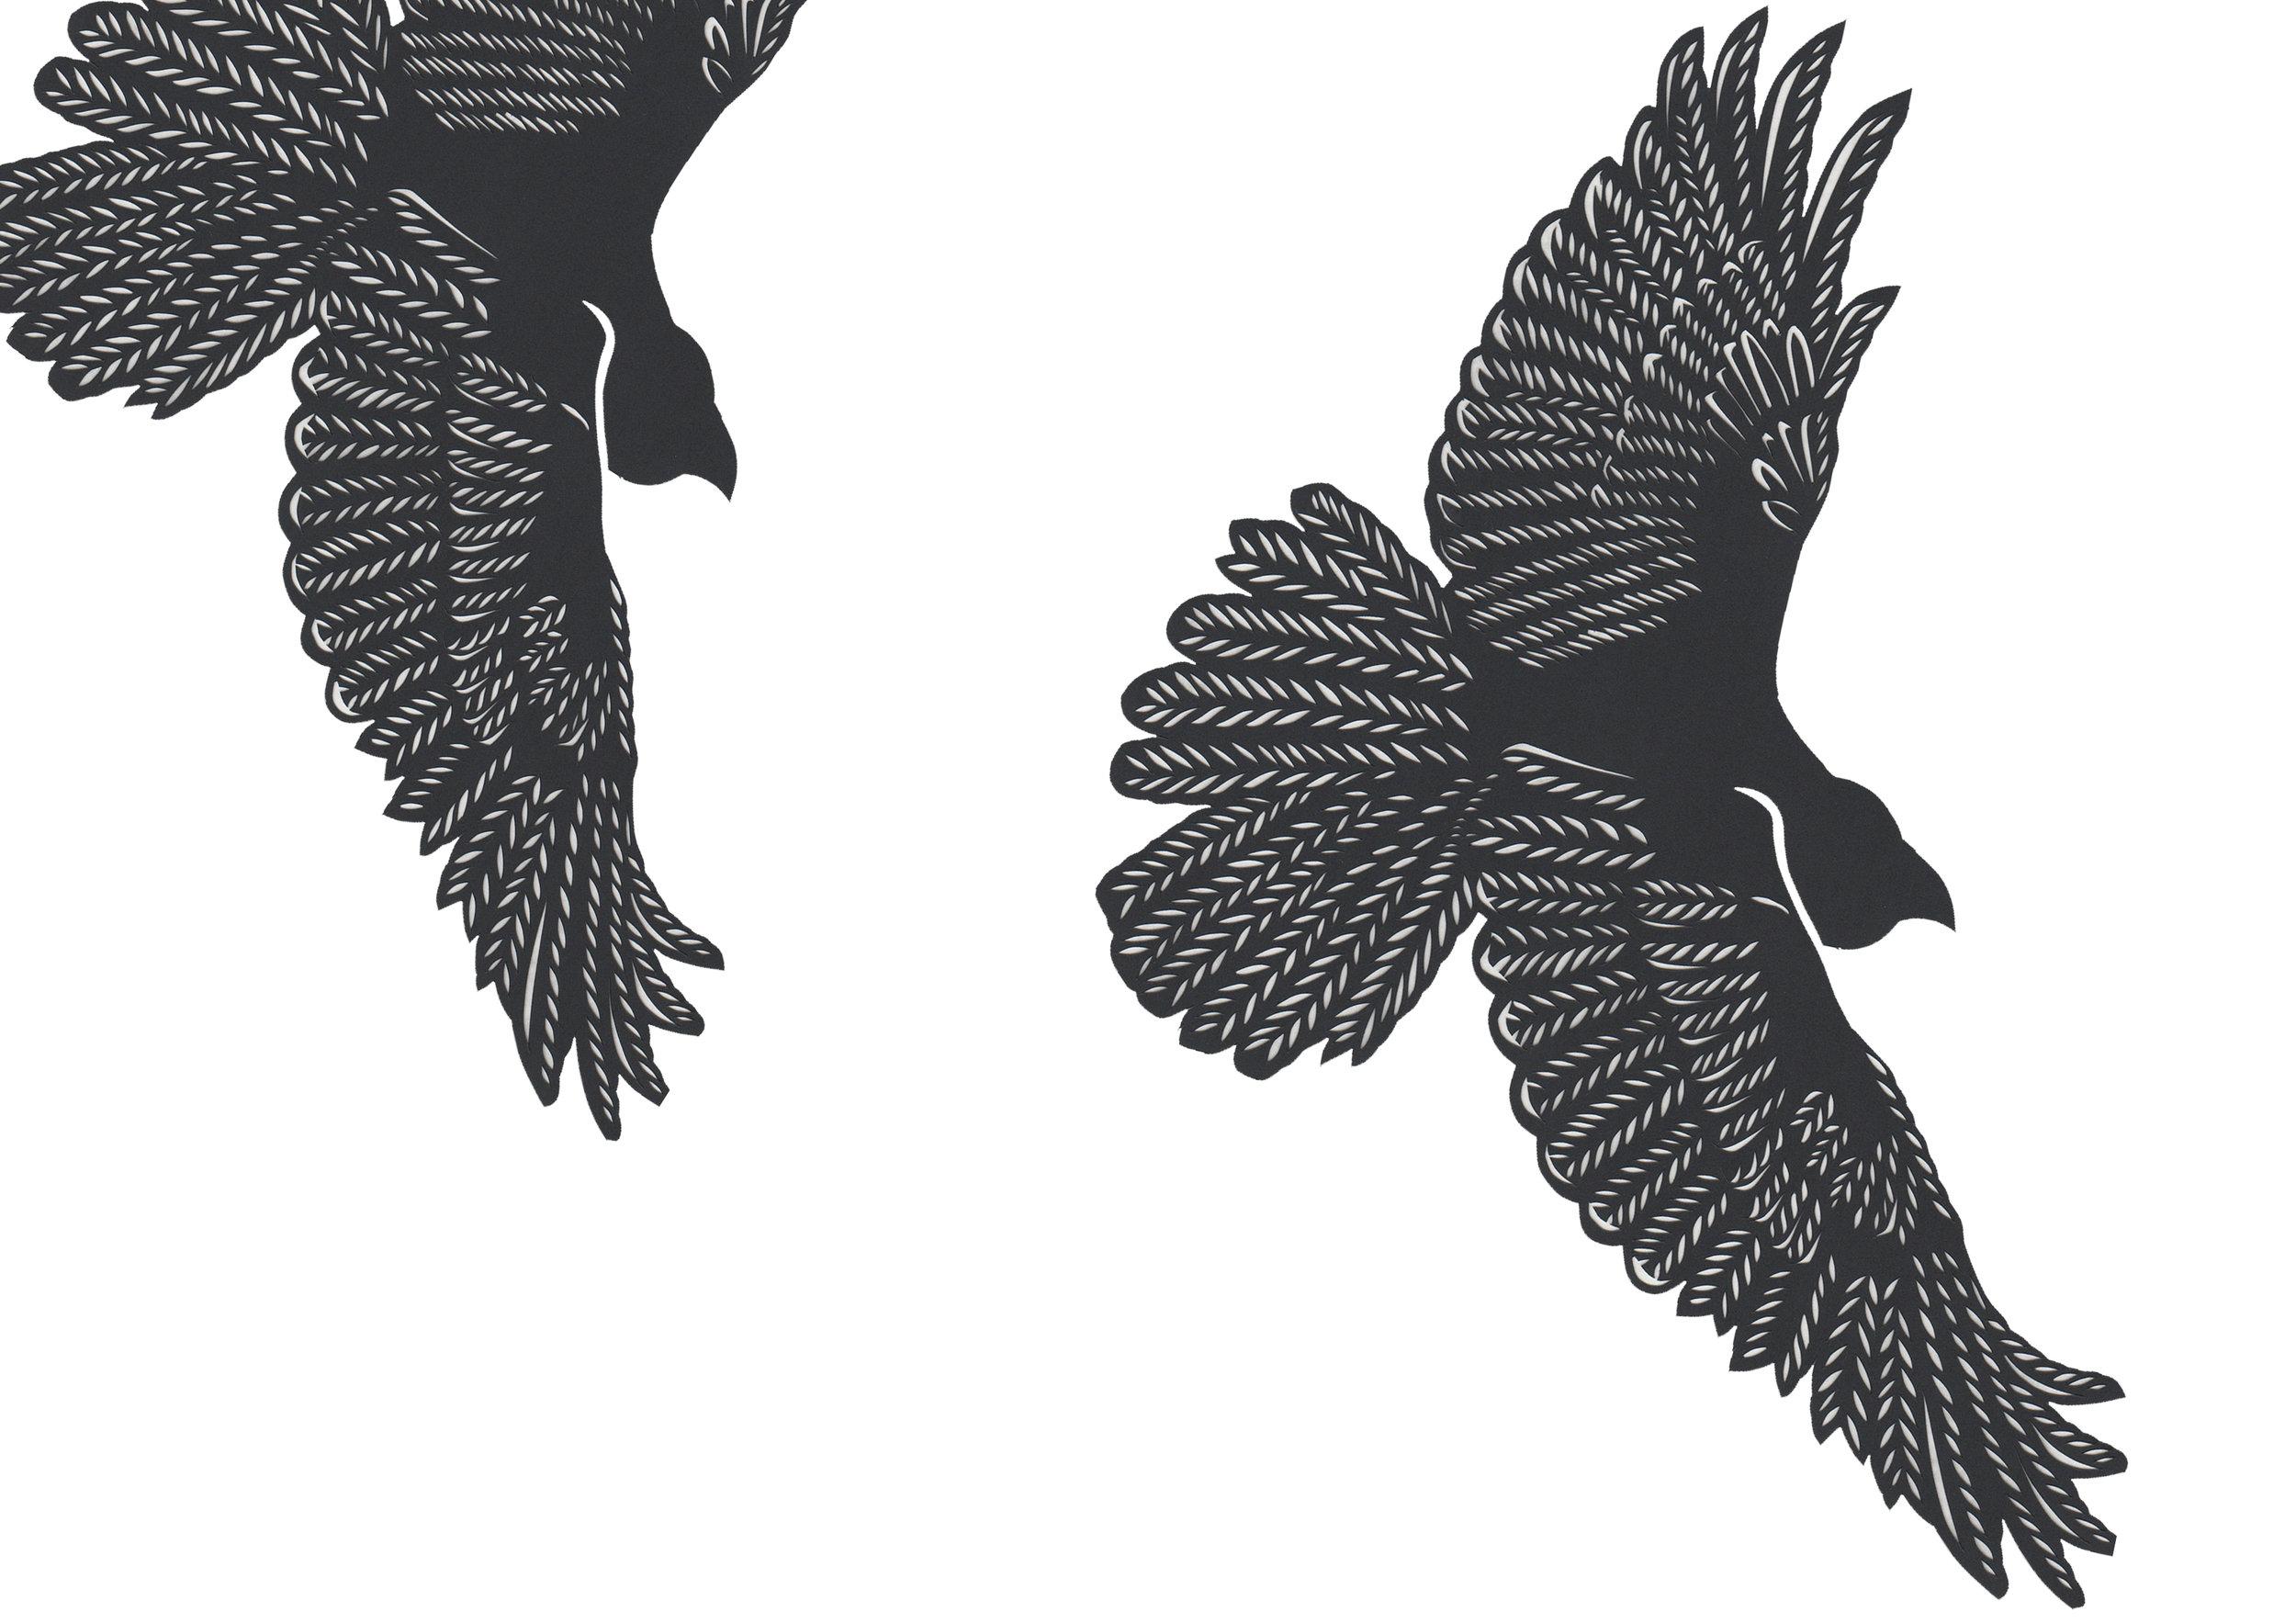 Lesley Clements - Illustrator